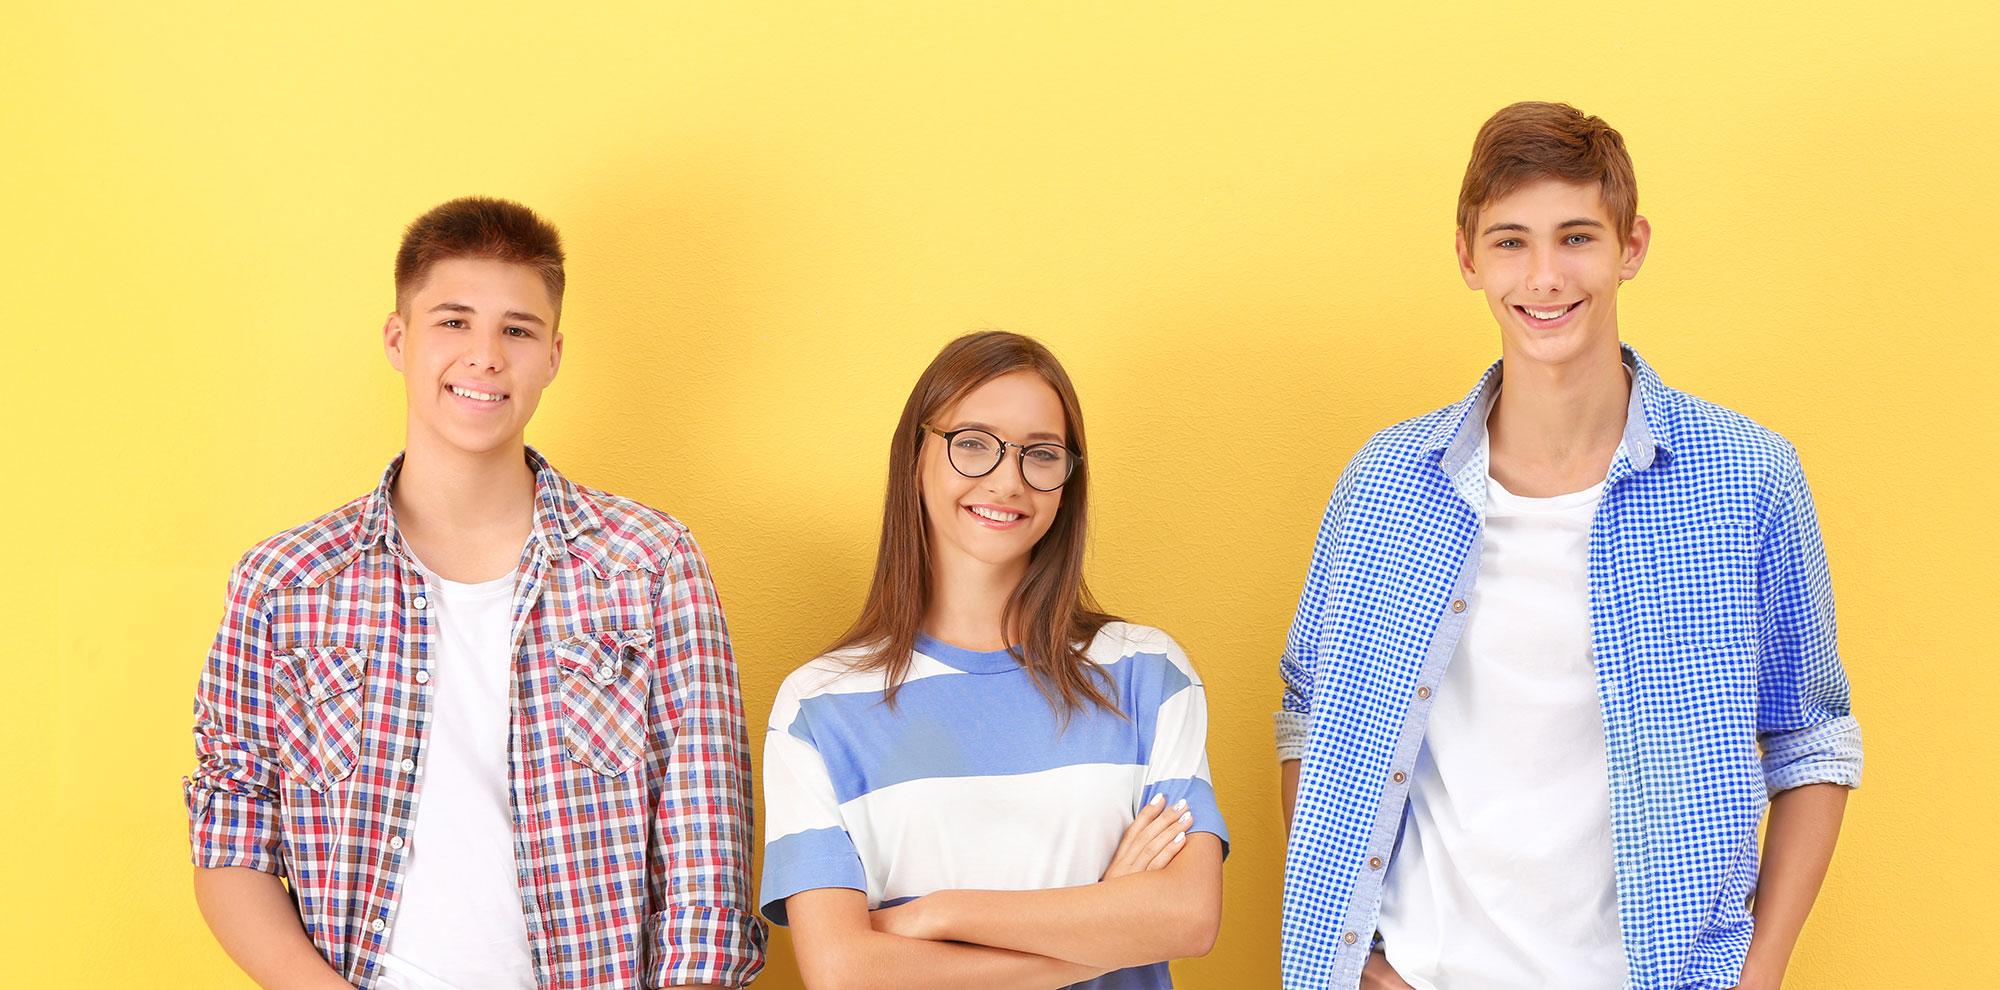 Doi baieti si o fata zambind dupa ce au luat certificatul dupa examenul Cambridge nivel B1 Preliminary